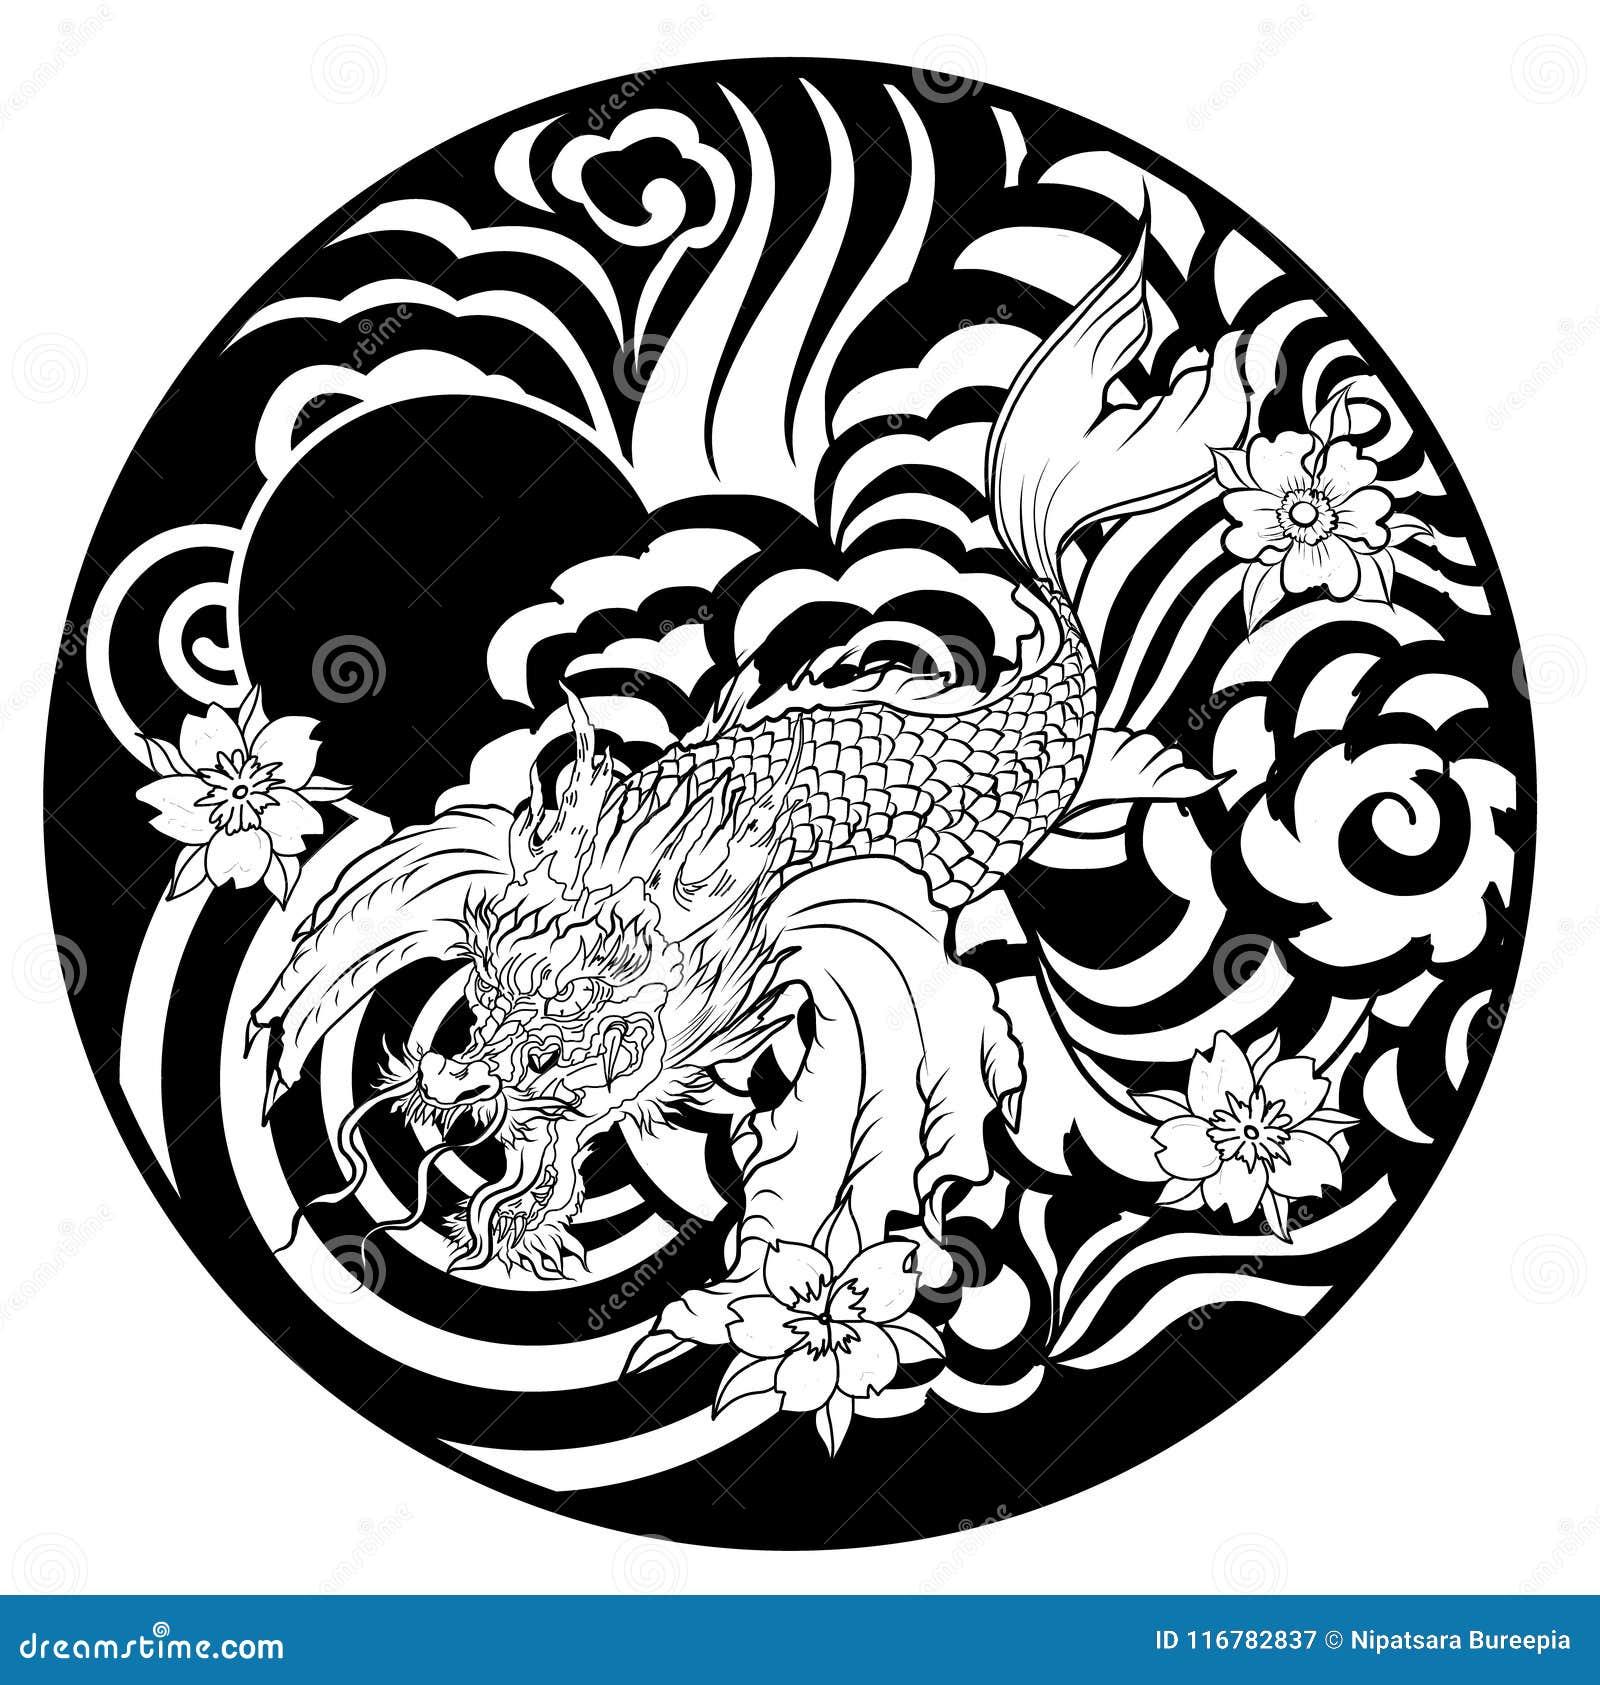 Dragon Head And Koi Carp Fish In Circle Design For Tattoo